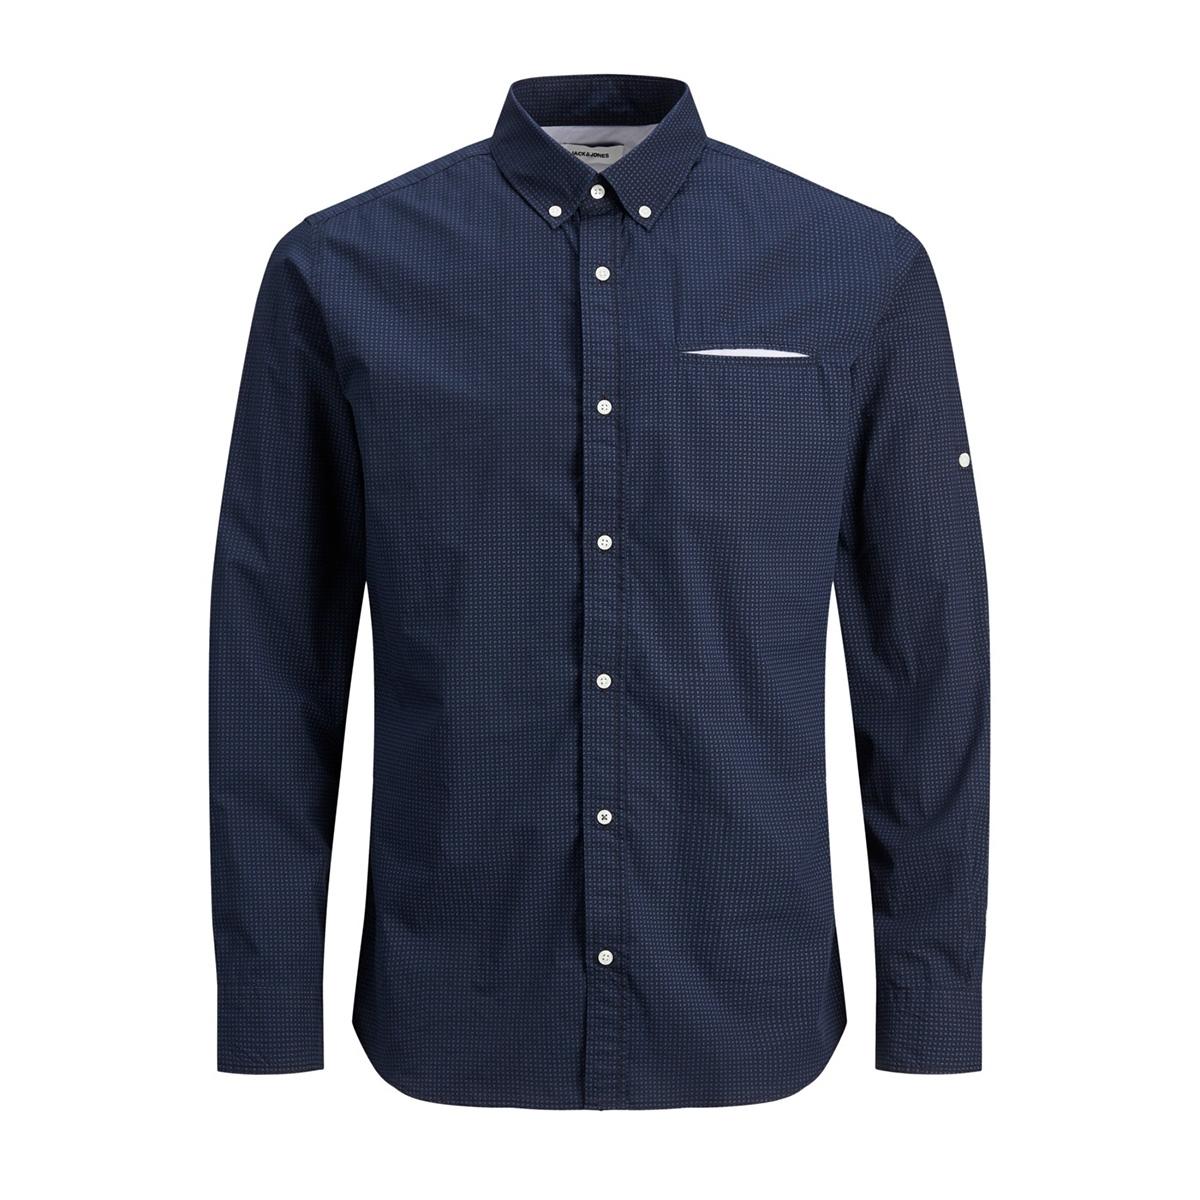 jjetape detail shirt l/s s20 sts 12166546 jack & jones overhemd navy blazer/slim fit